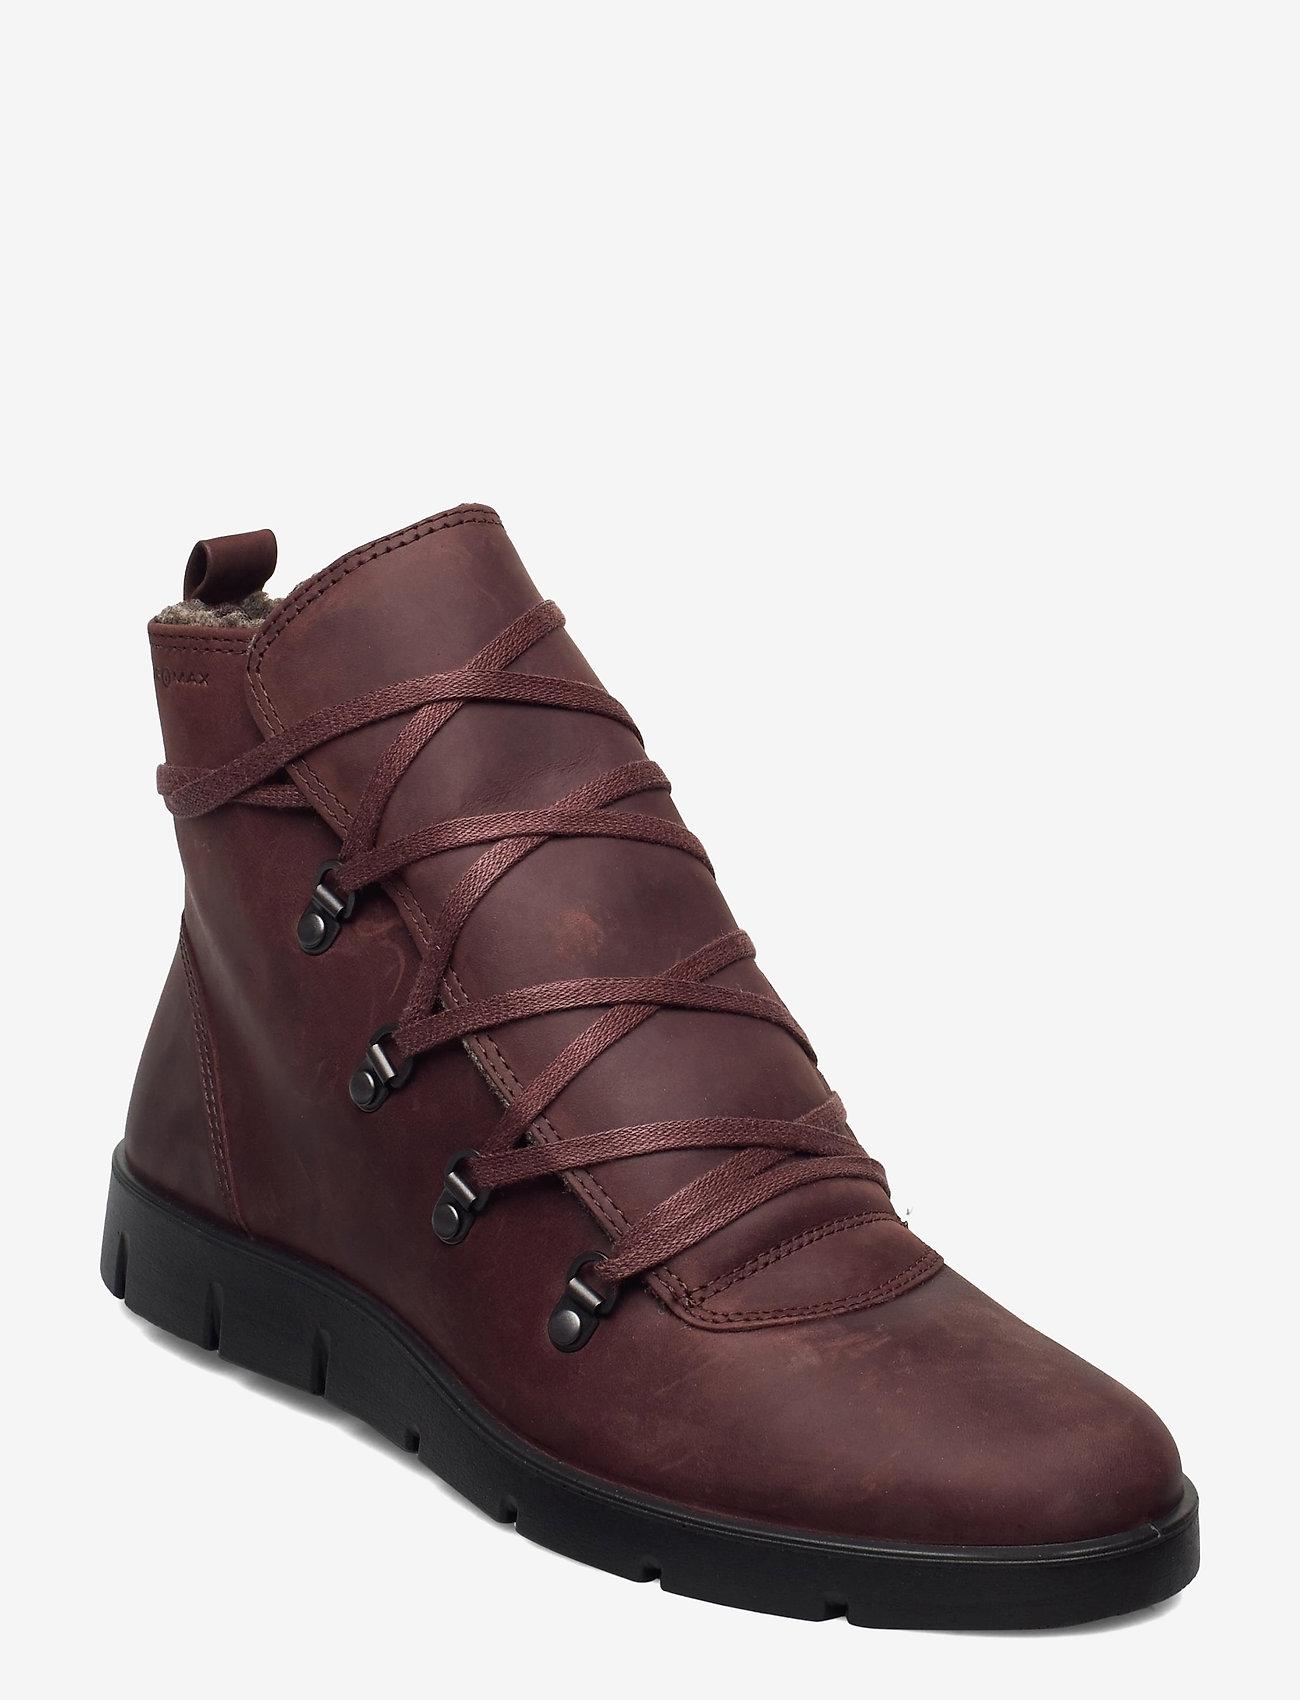 ECCO - BELLA - flat ankle boots - chocolat - 0